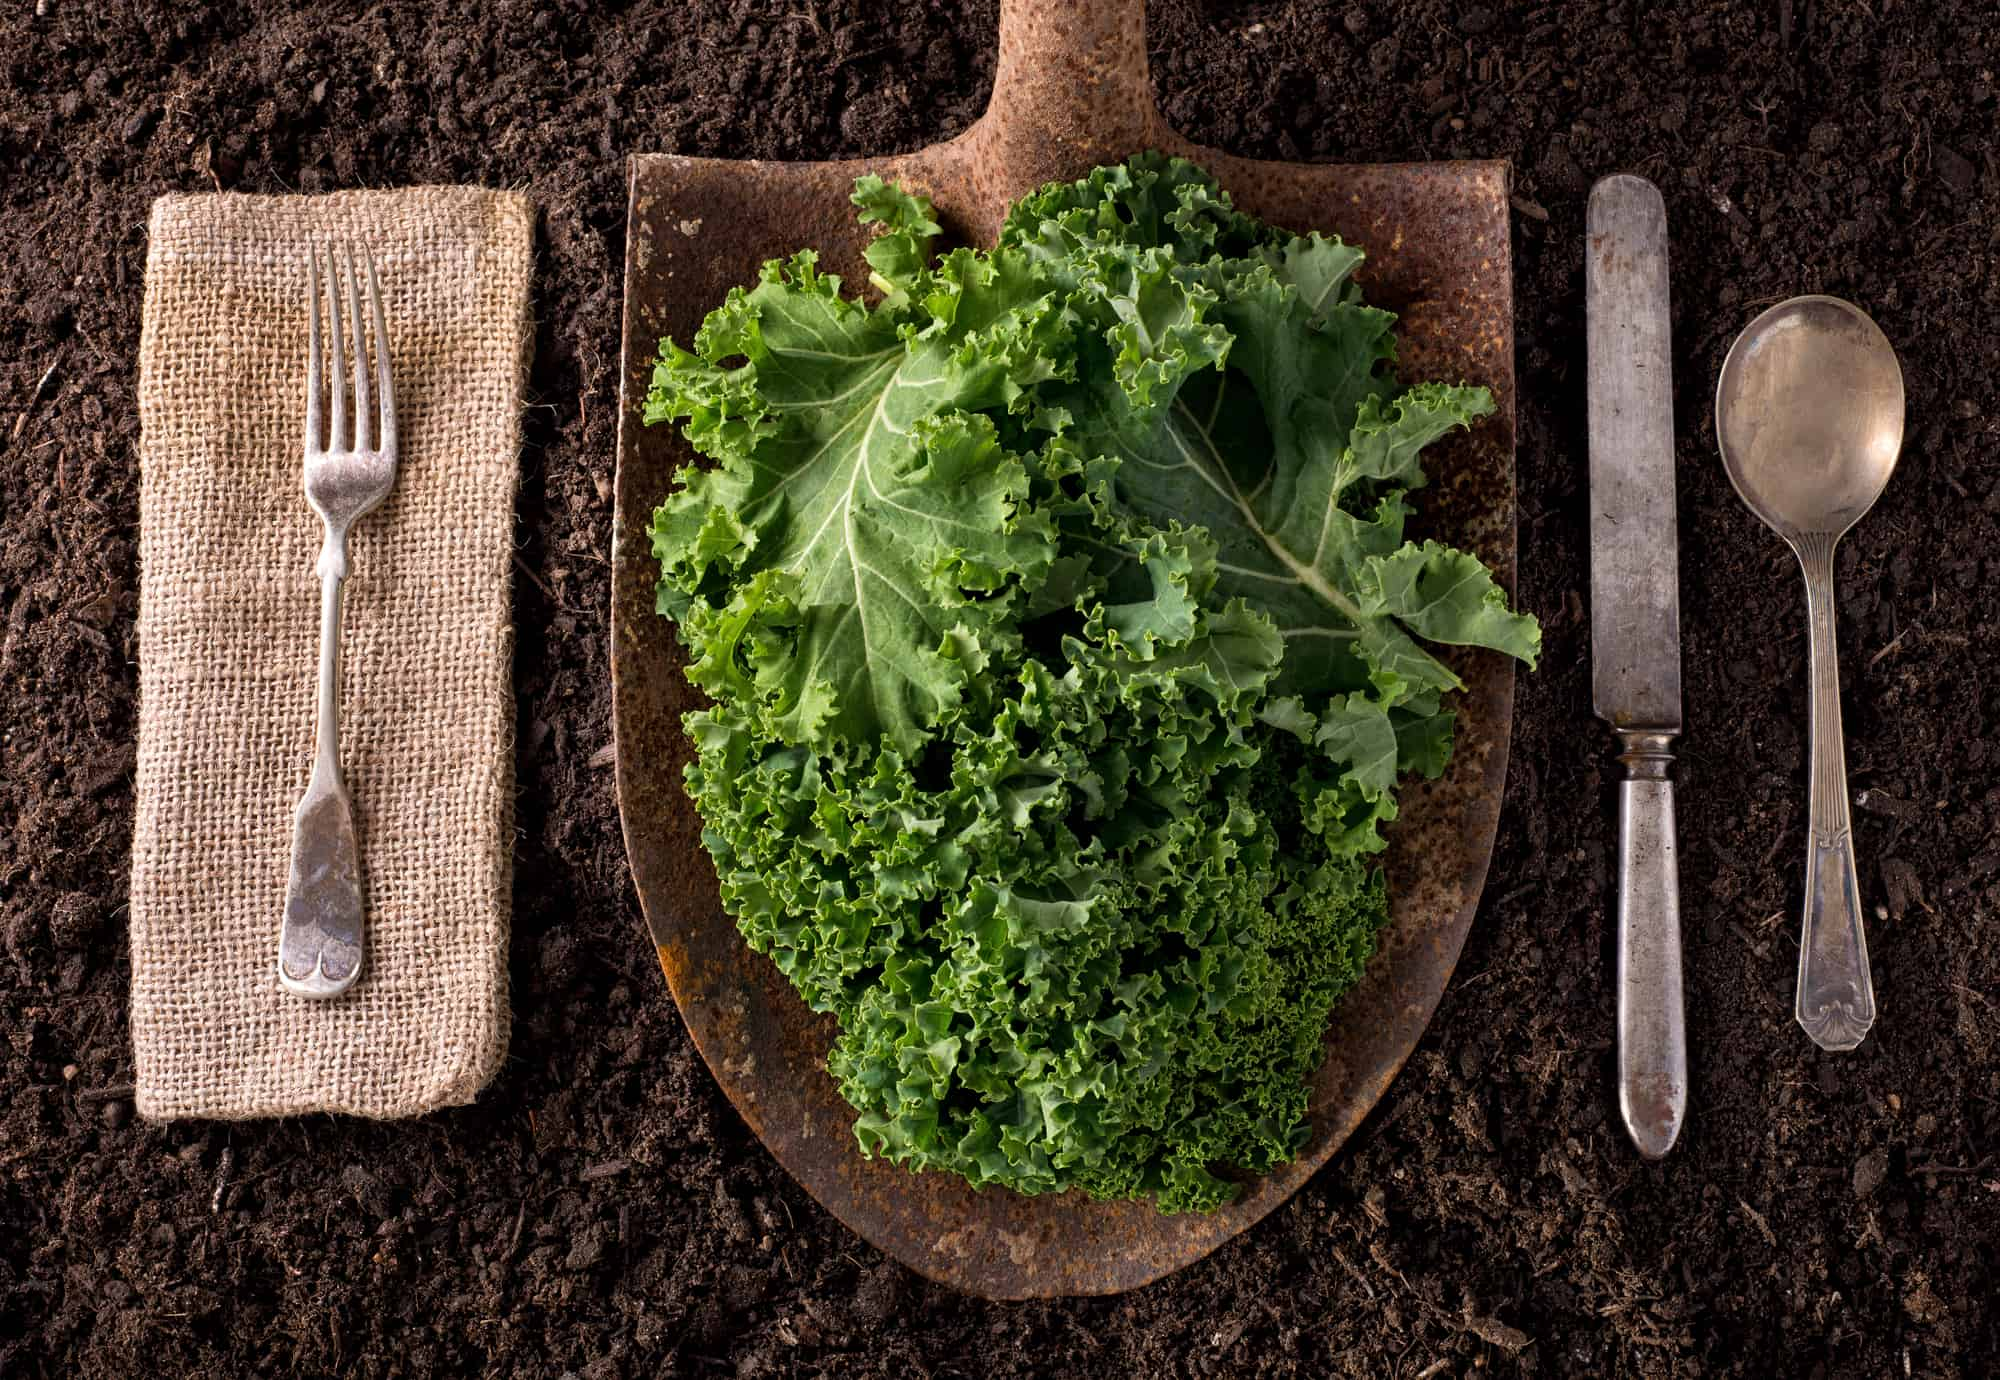 kale from an organic farm on a shovel